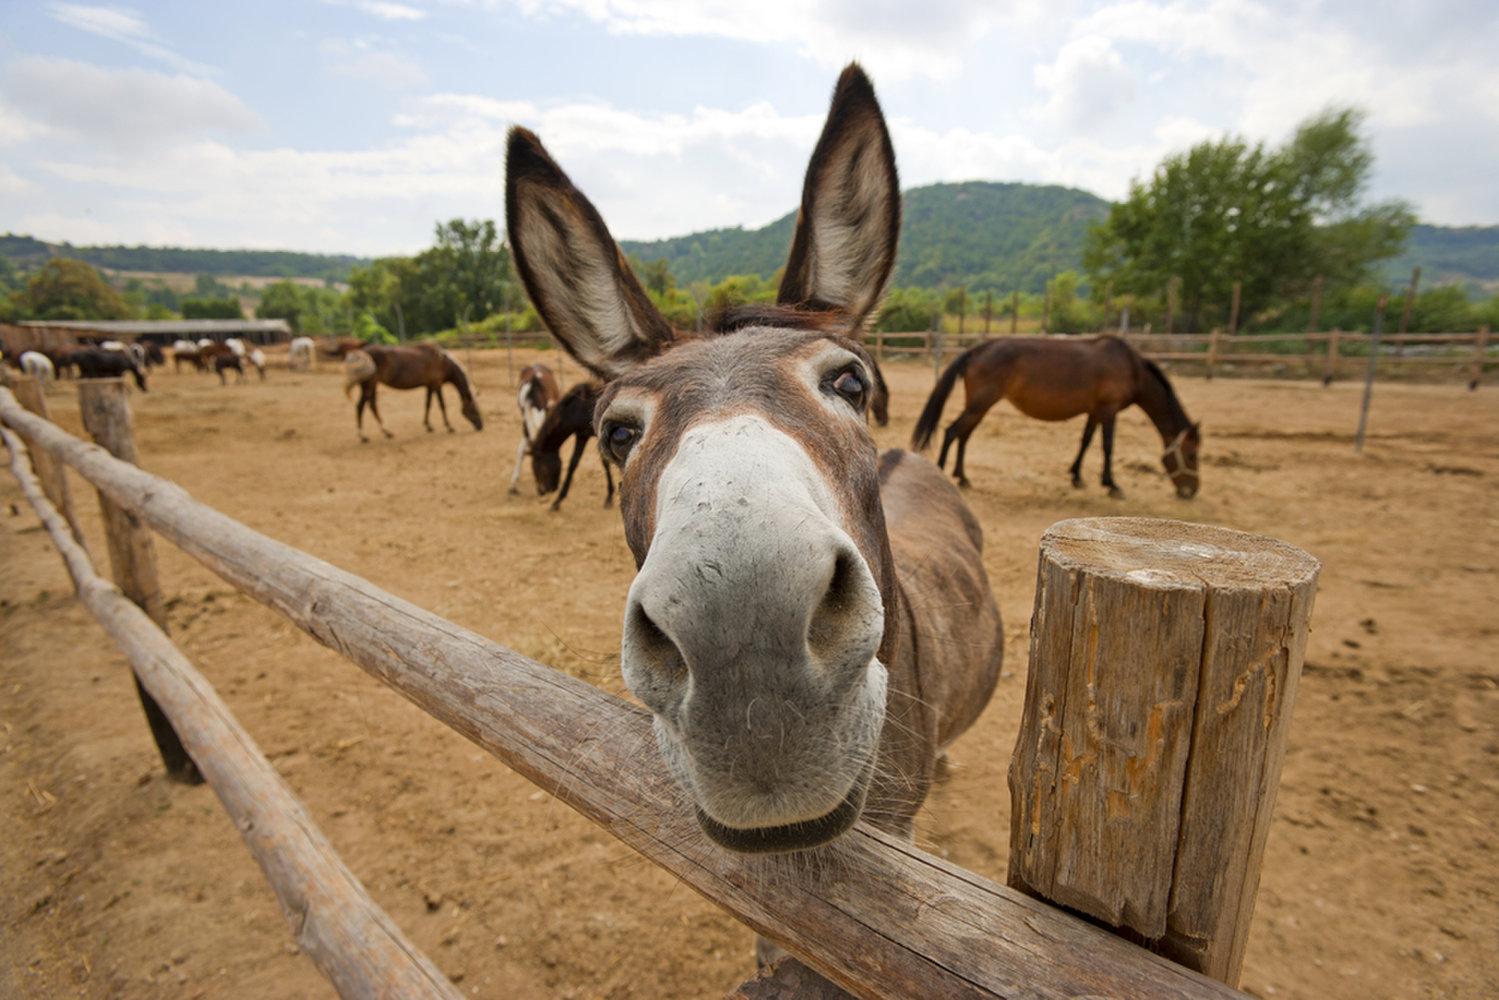 Donkey Pics, Animal Collection